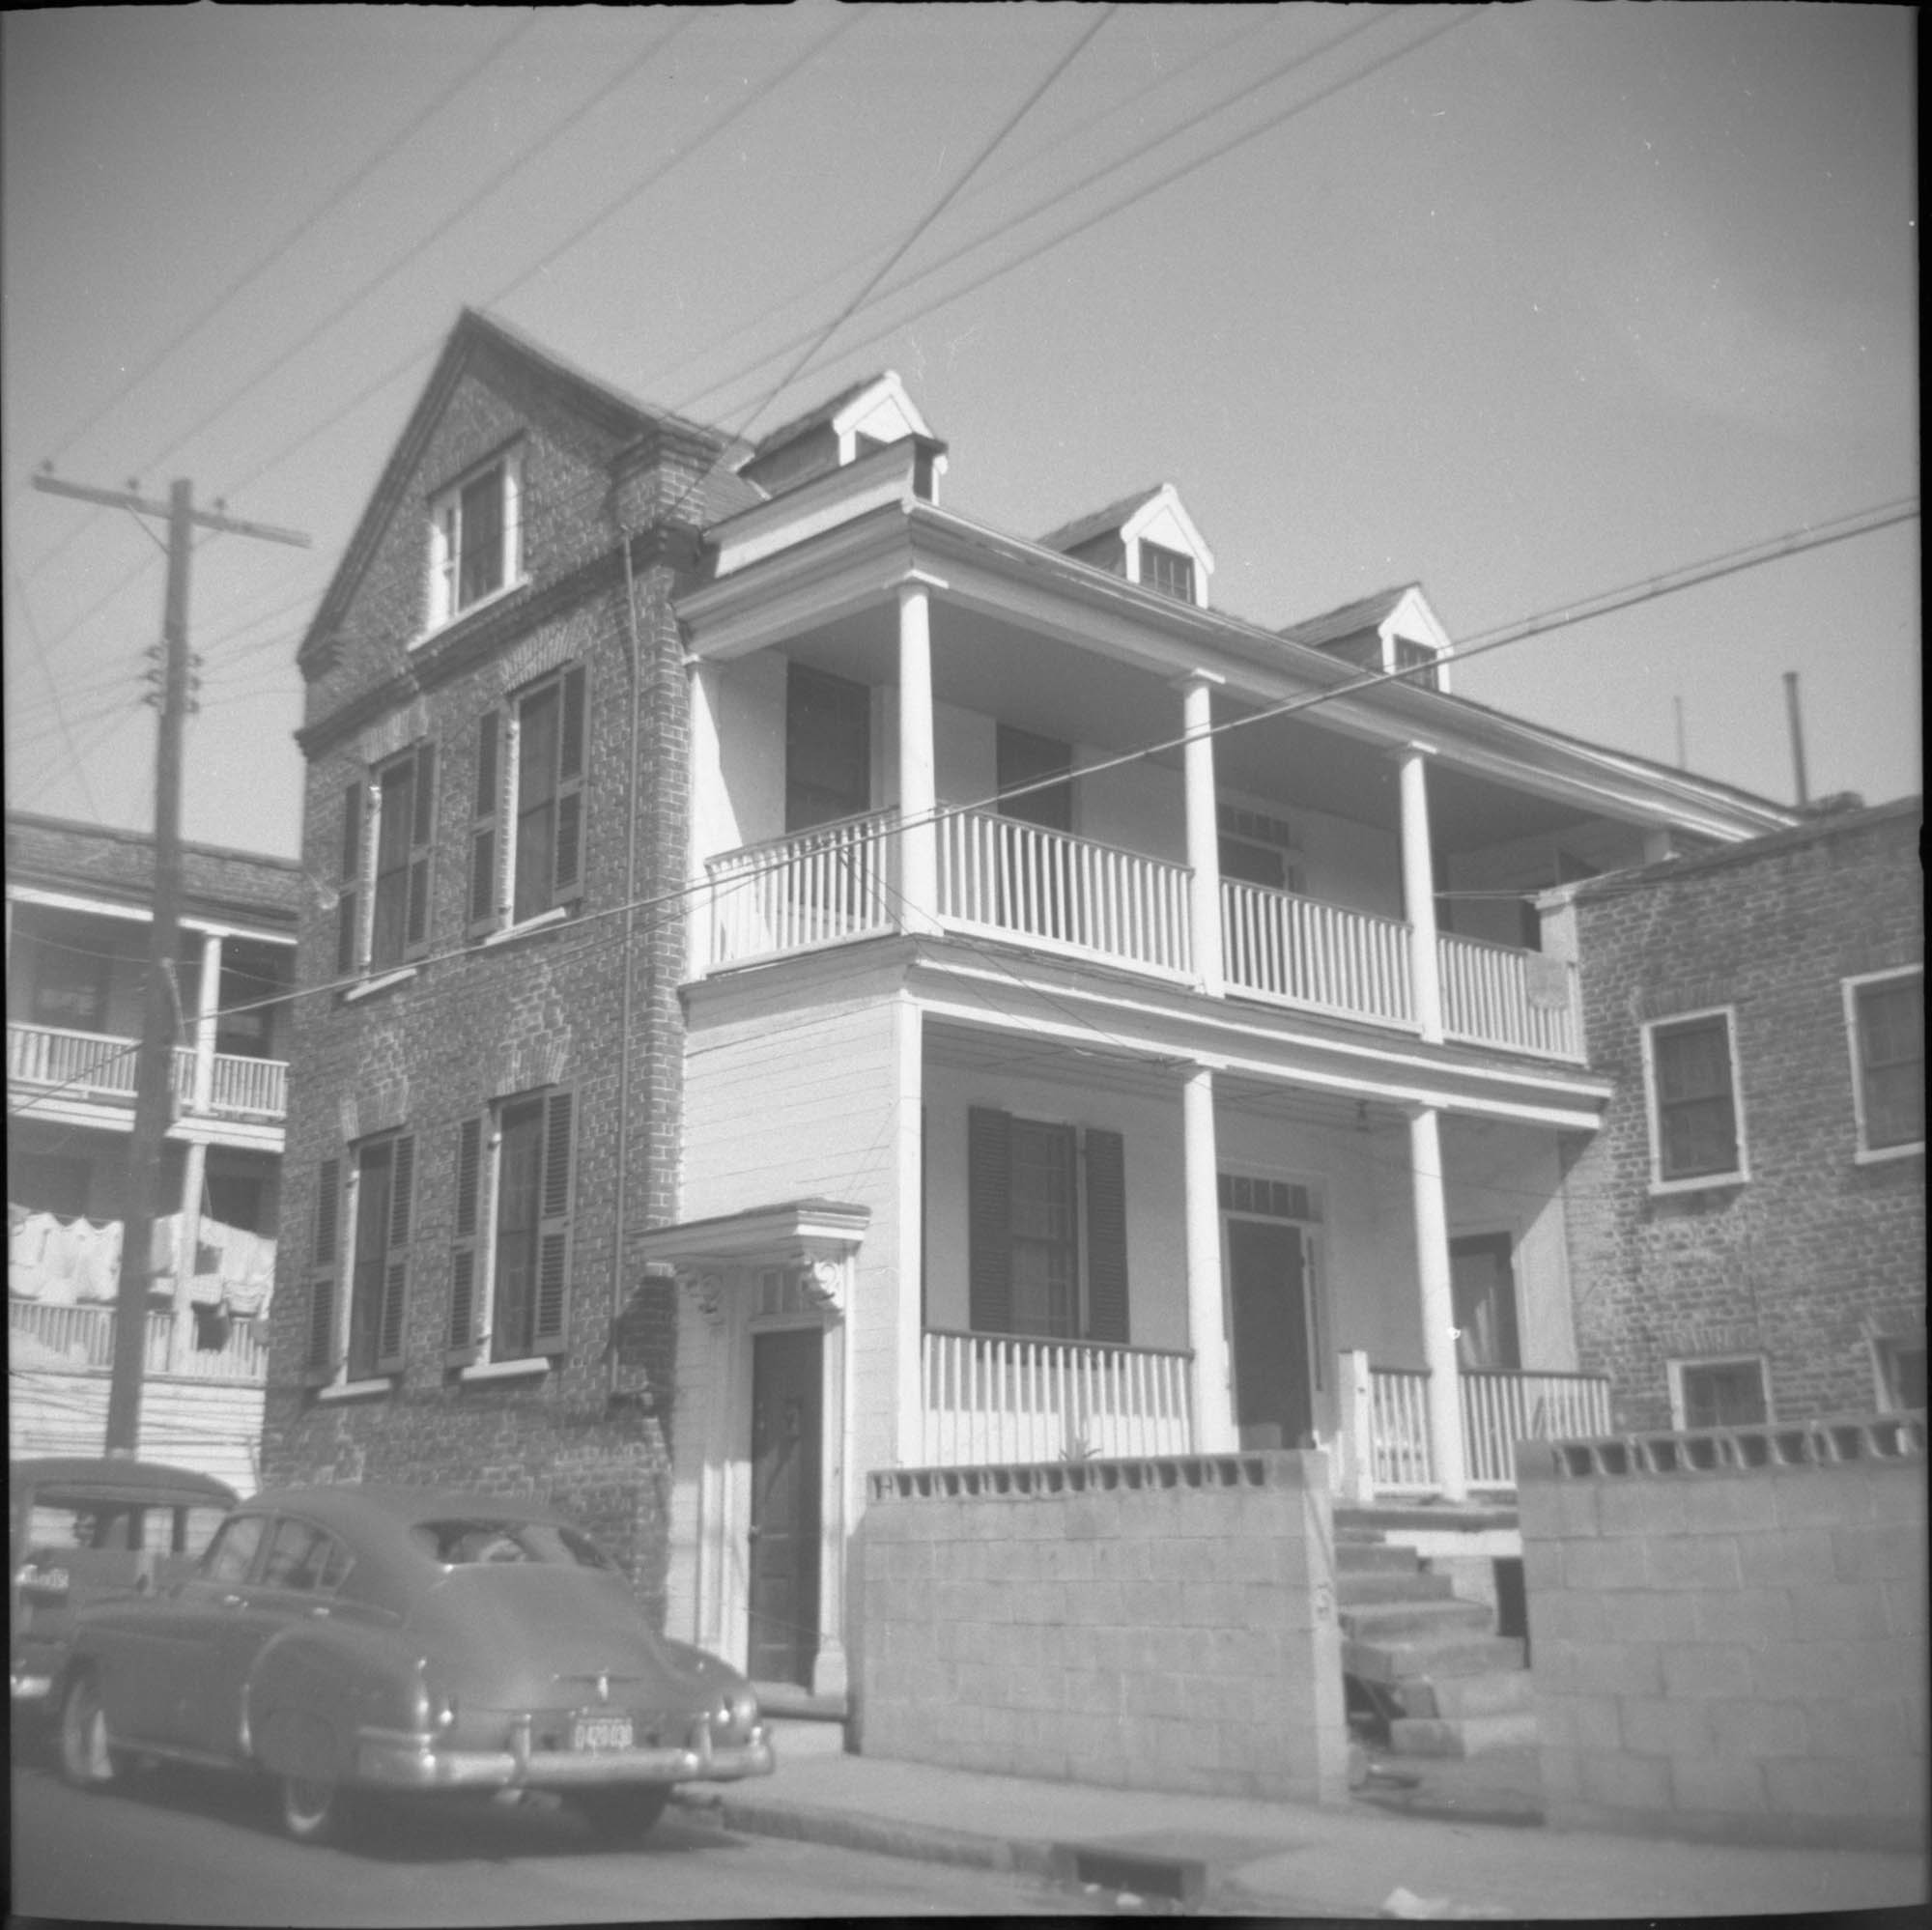 56 Anson Street